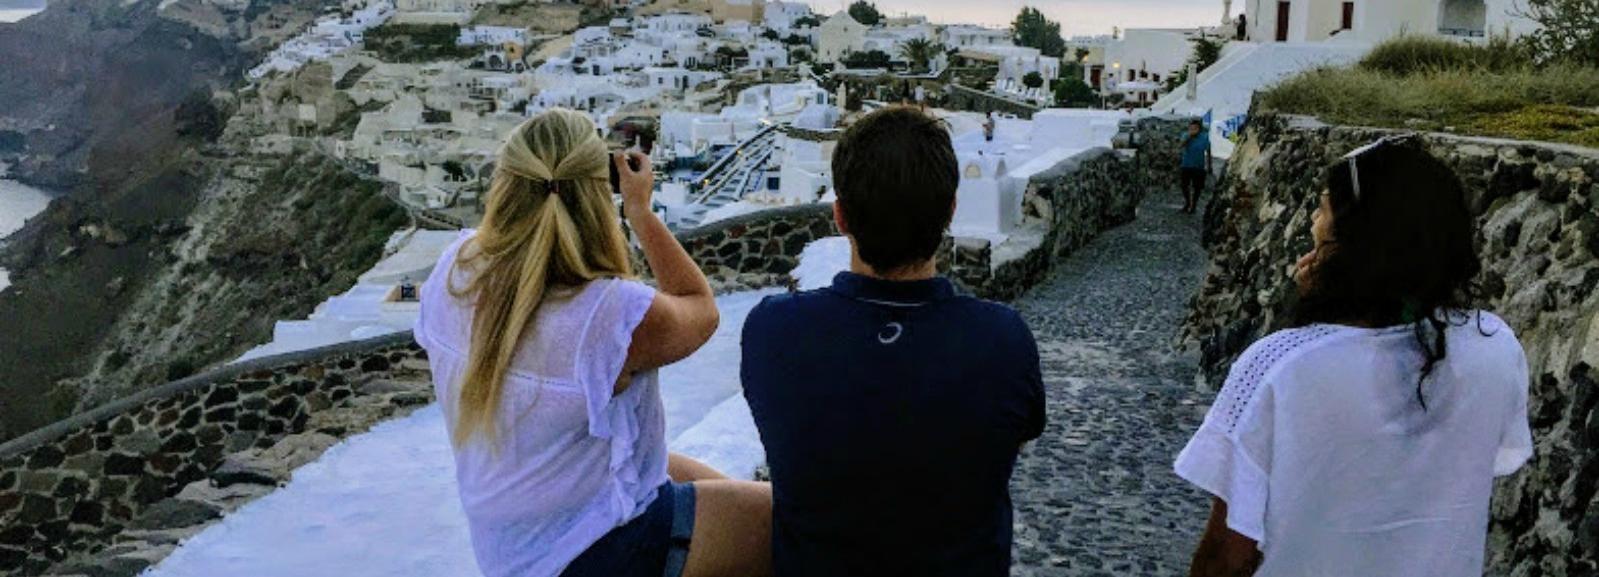 Santorini Small Group Tour with Wine Tasting